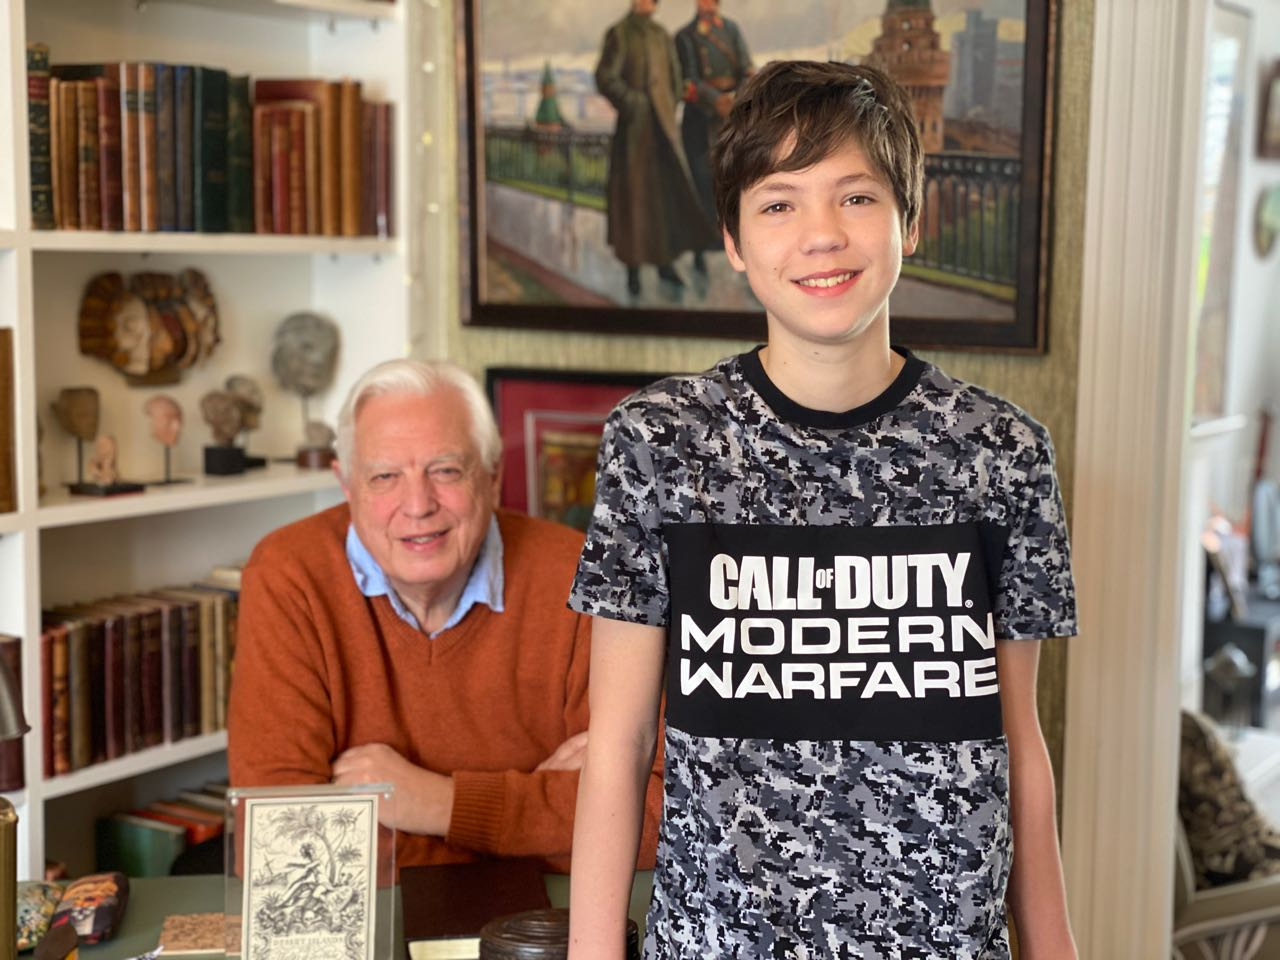 John Simpson and his son Rafe